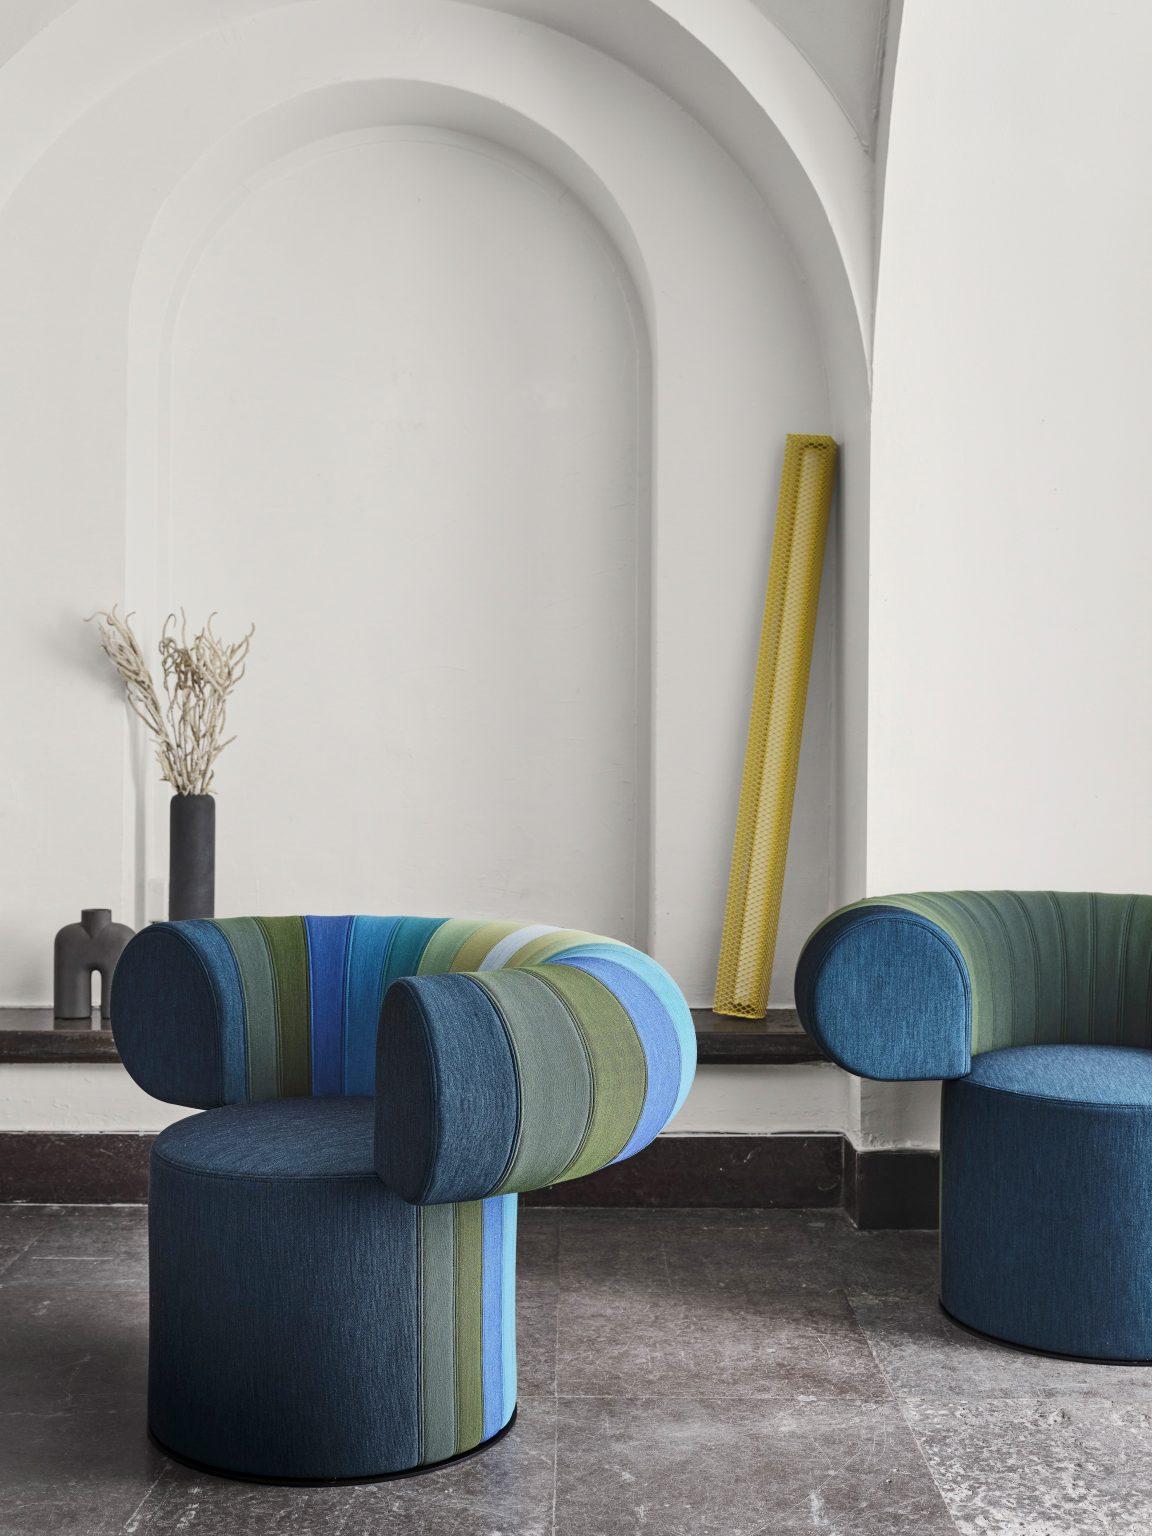 Biennale Interieur - Belgium's leading design and interior event - Big-talk-project-6-new.jpg